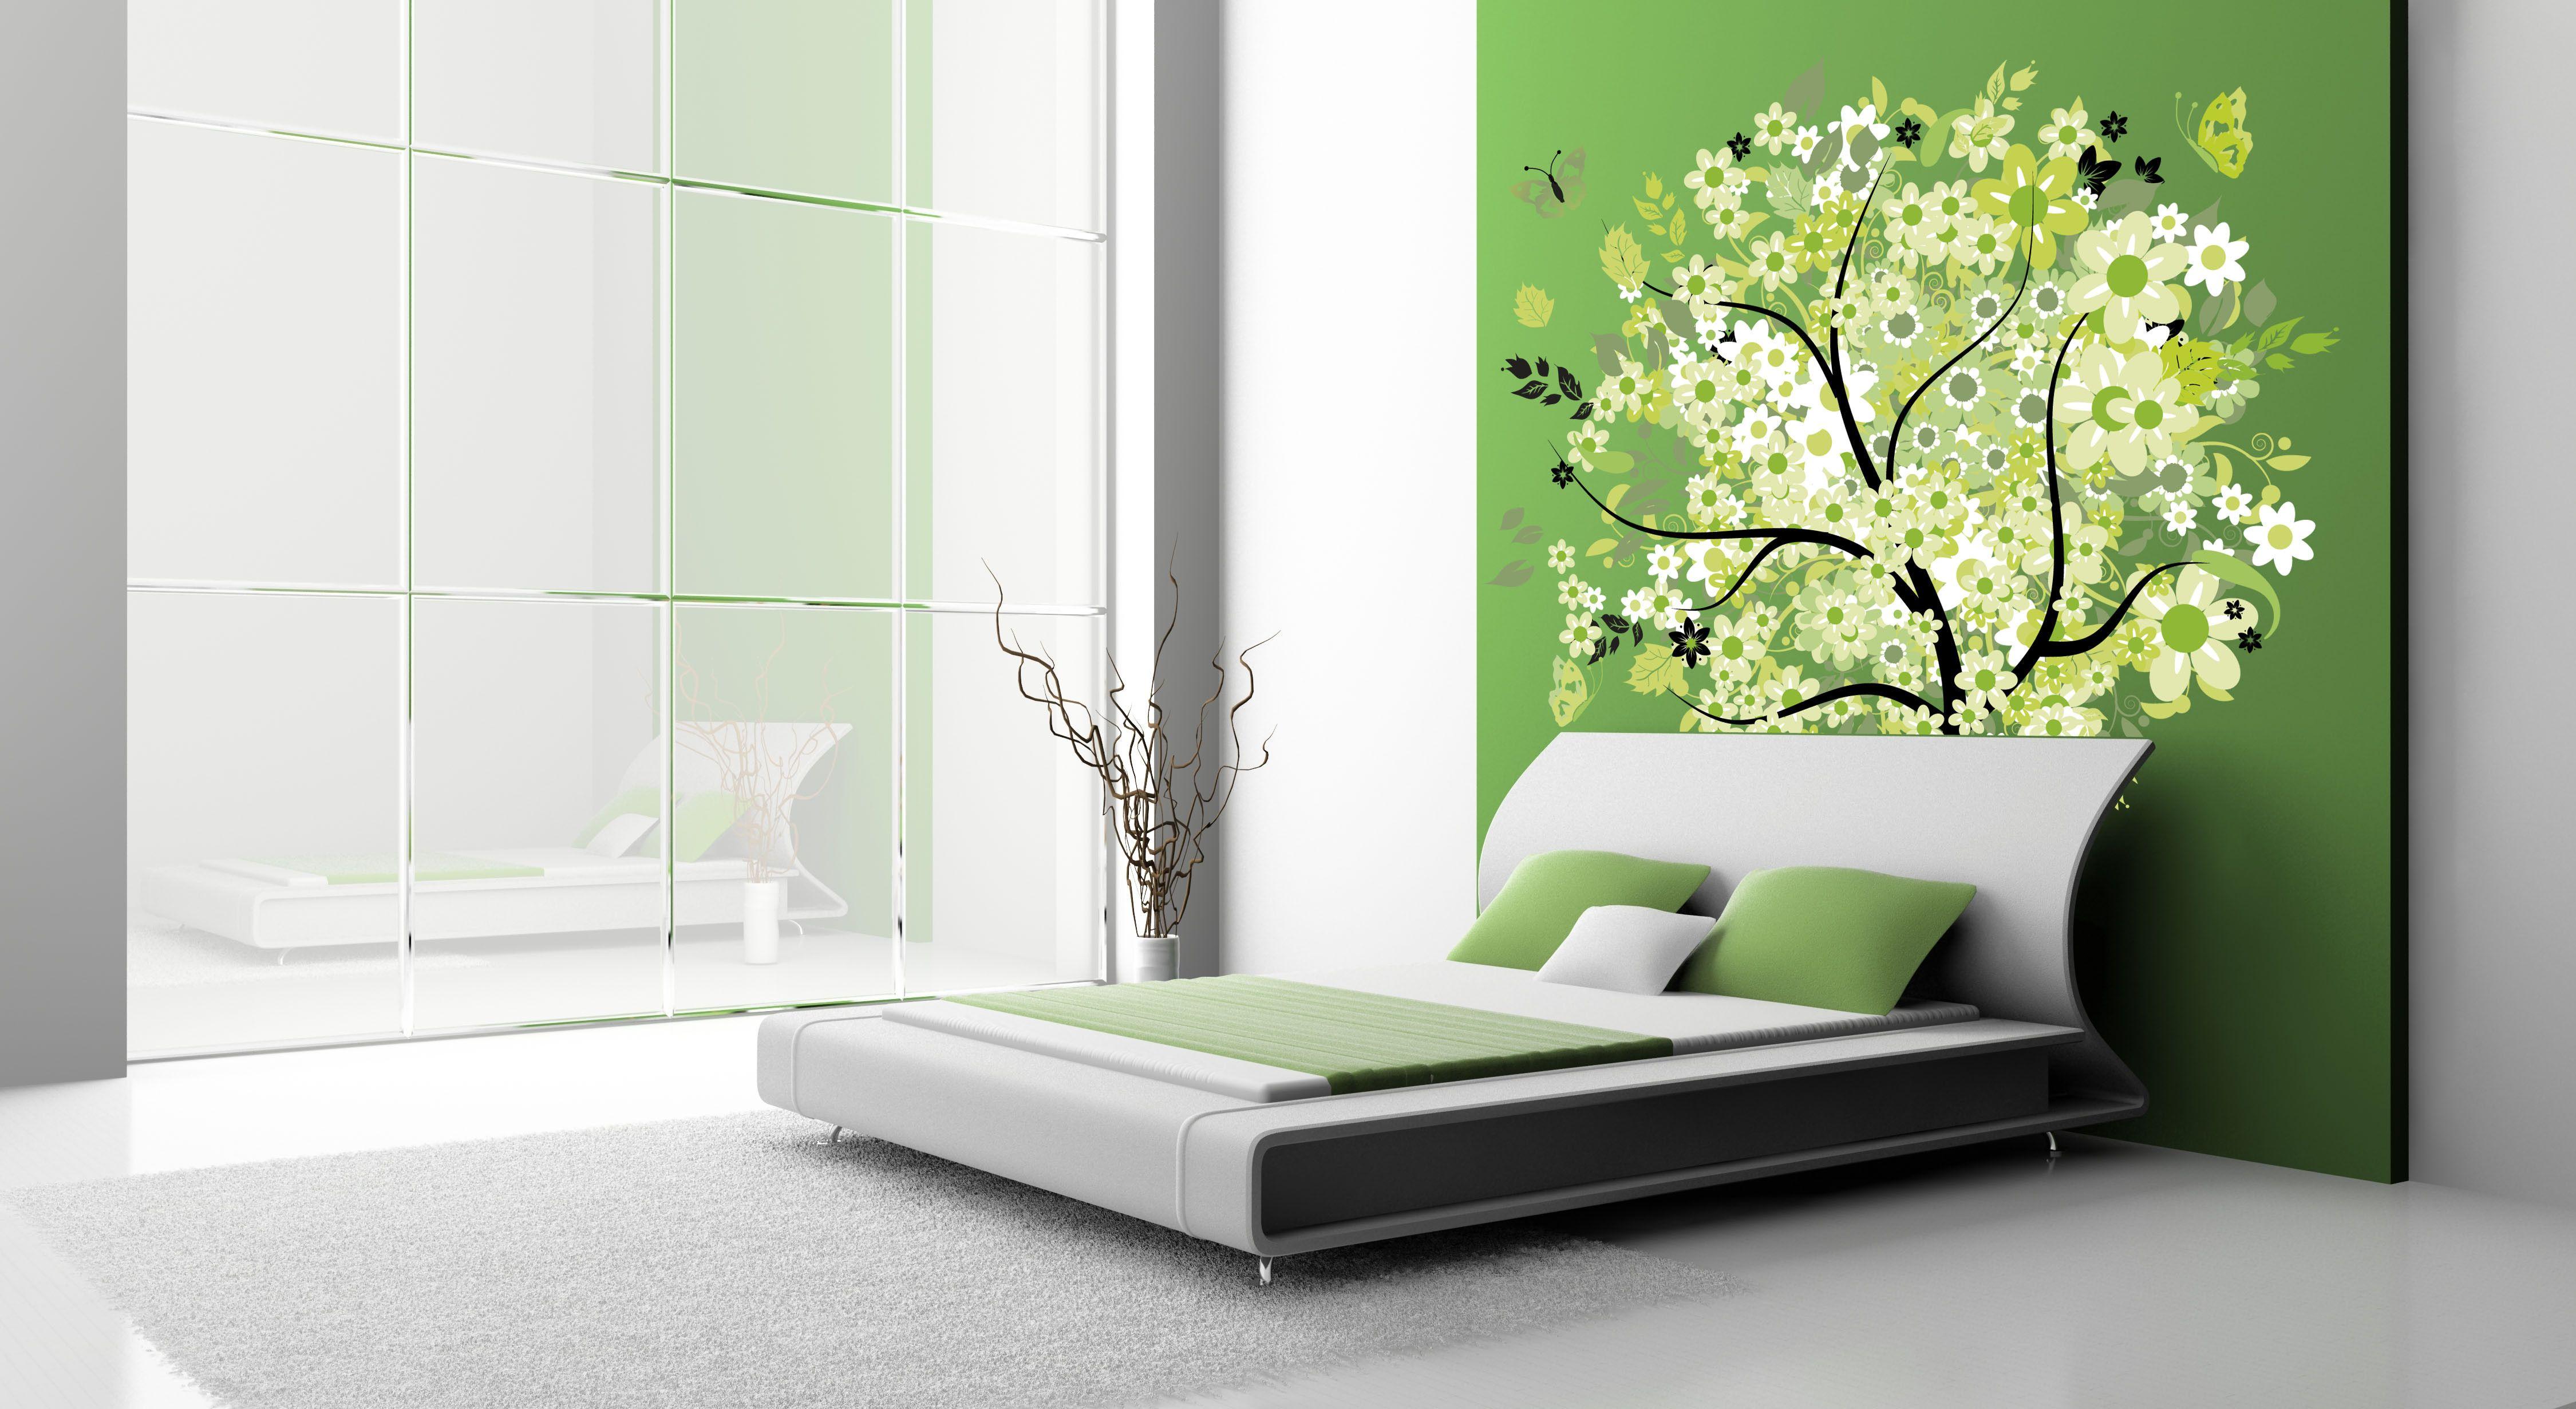 Green Bedroom Ideas Hd Decorate Wall Decor Bedroom Bedroom